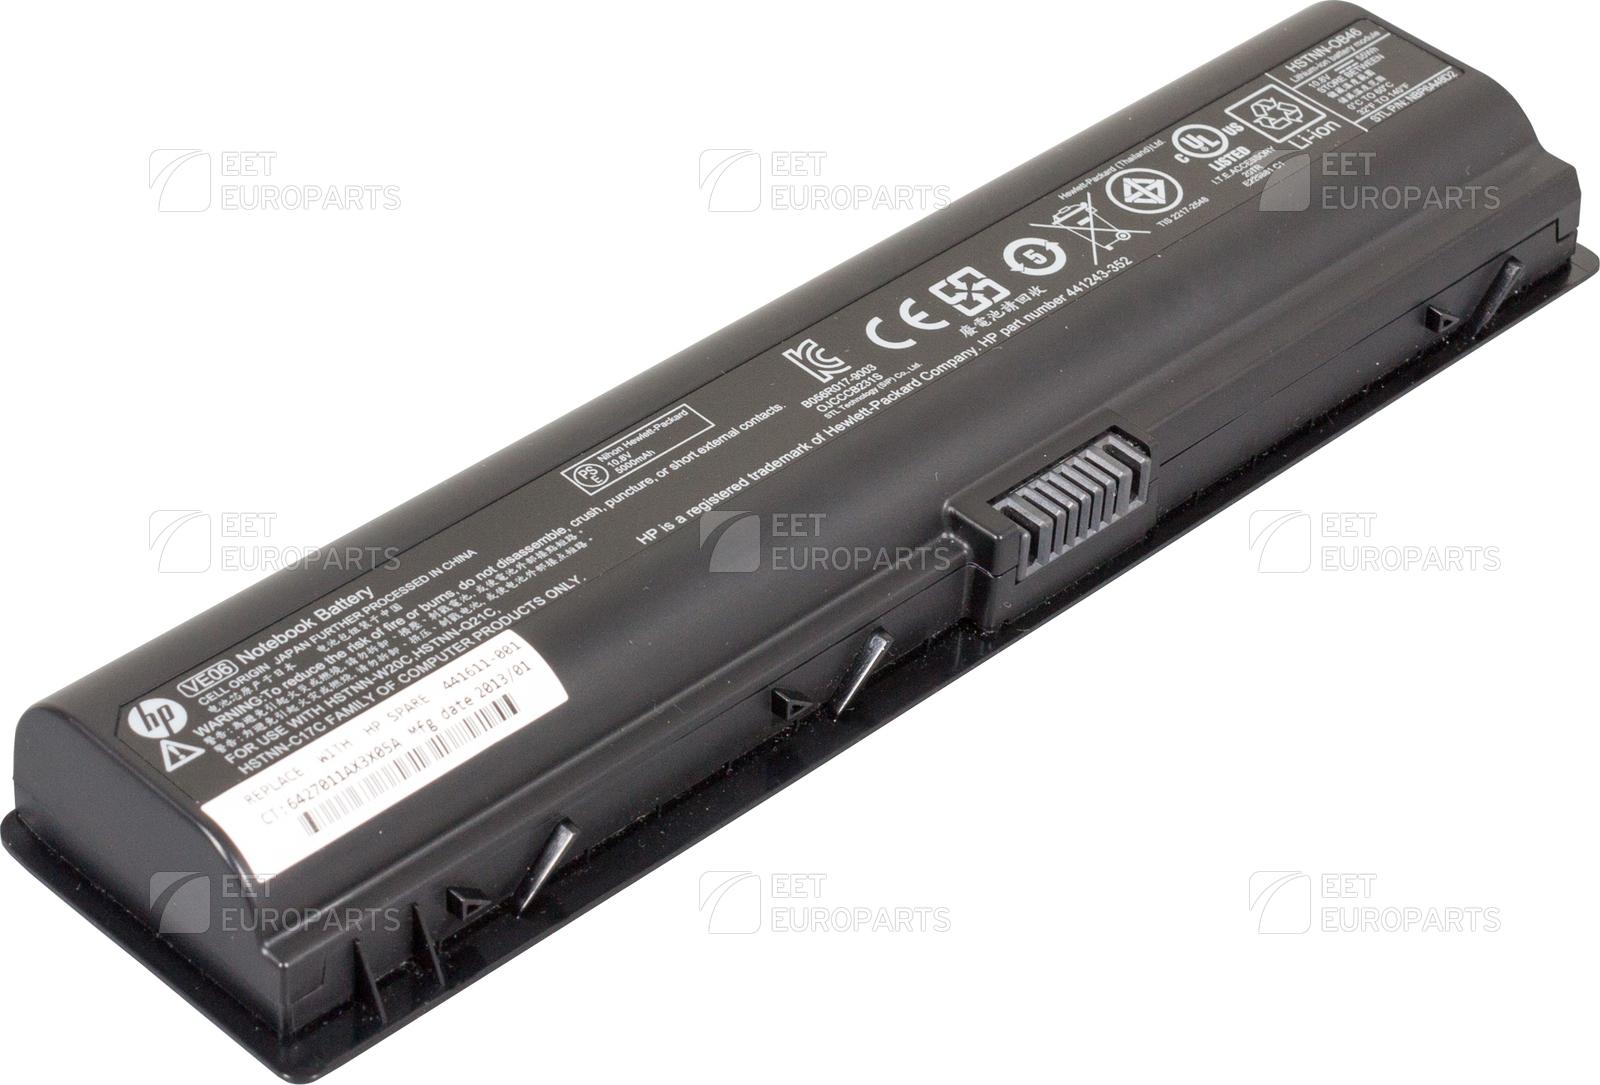 HP 441243-251